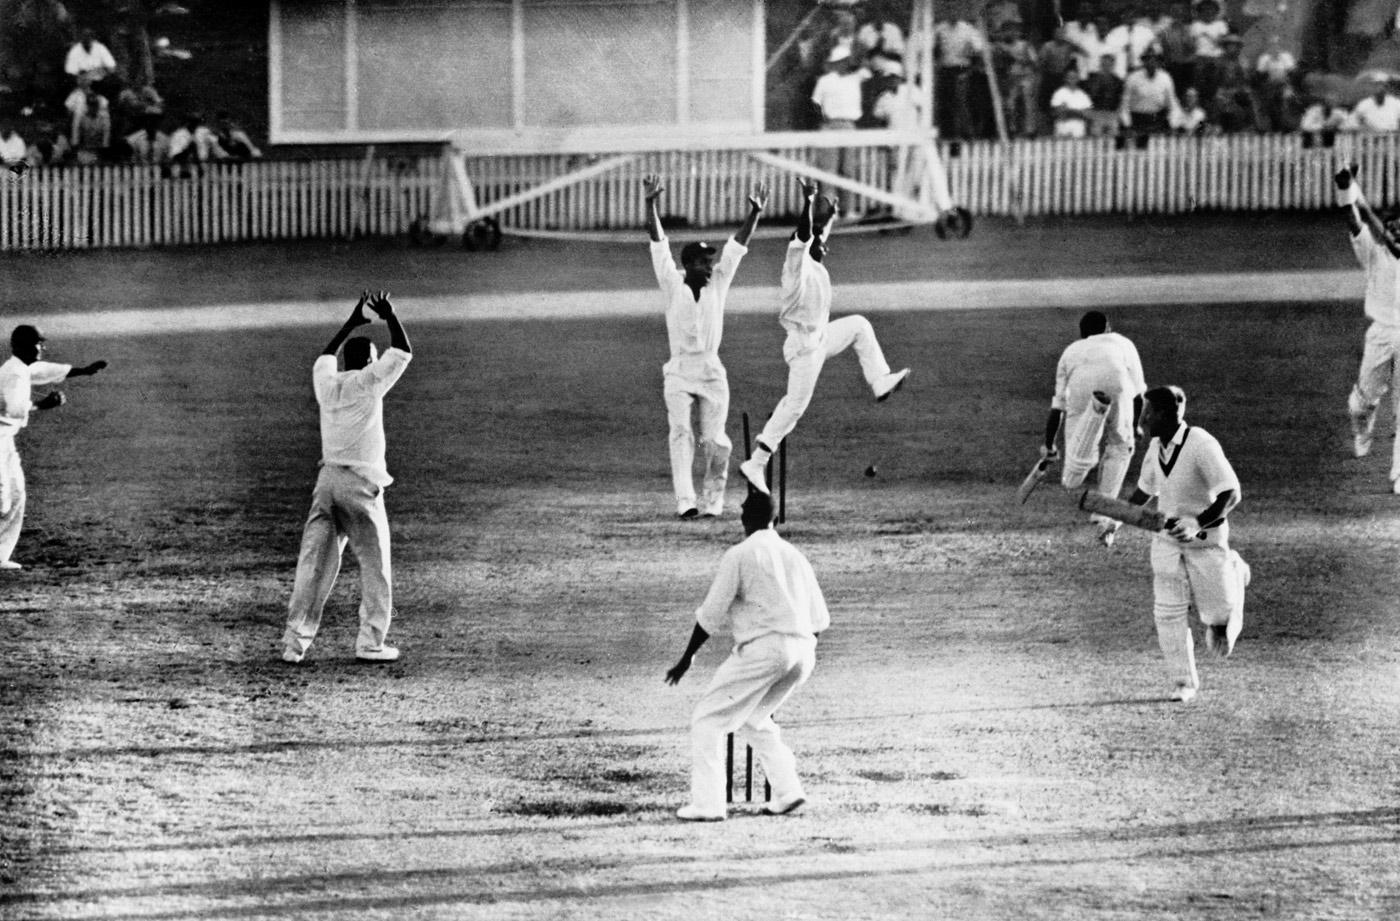 Australian batsman Ian Meckiff is run out to secure Test cricket's first tie